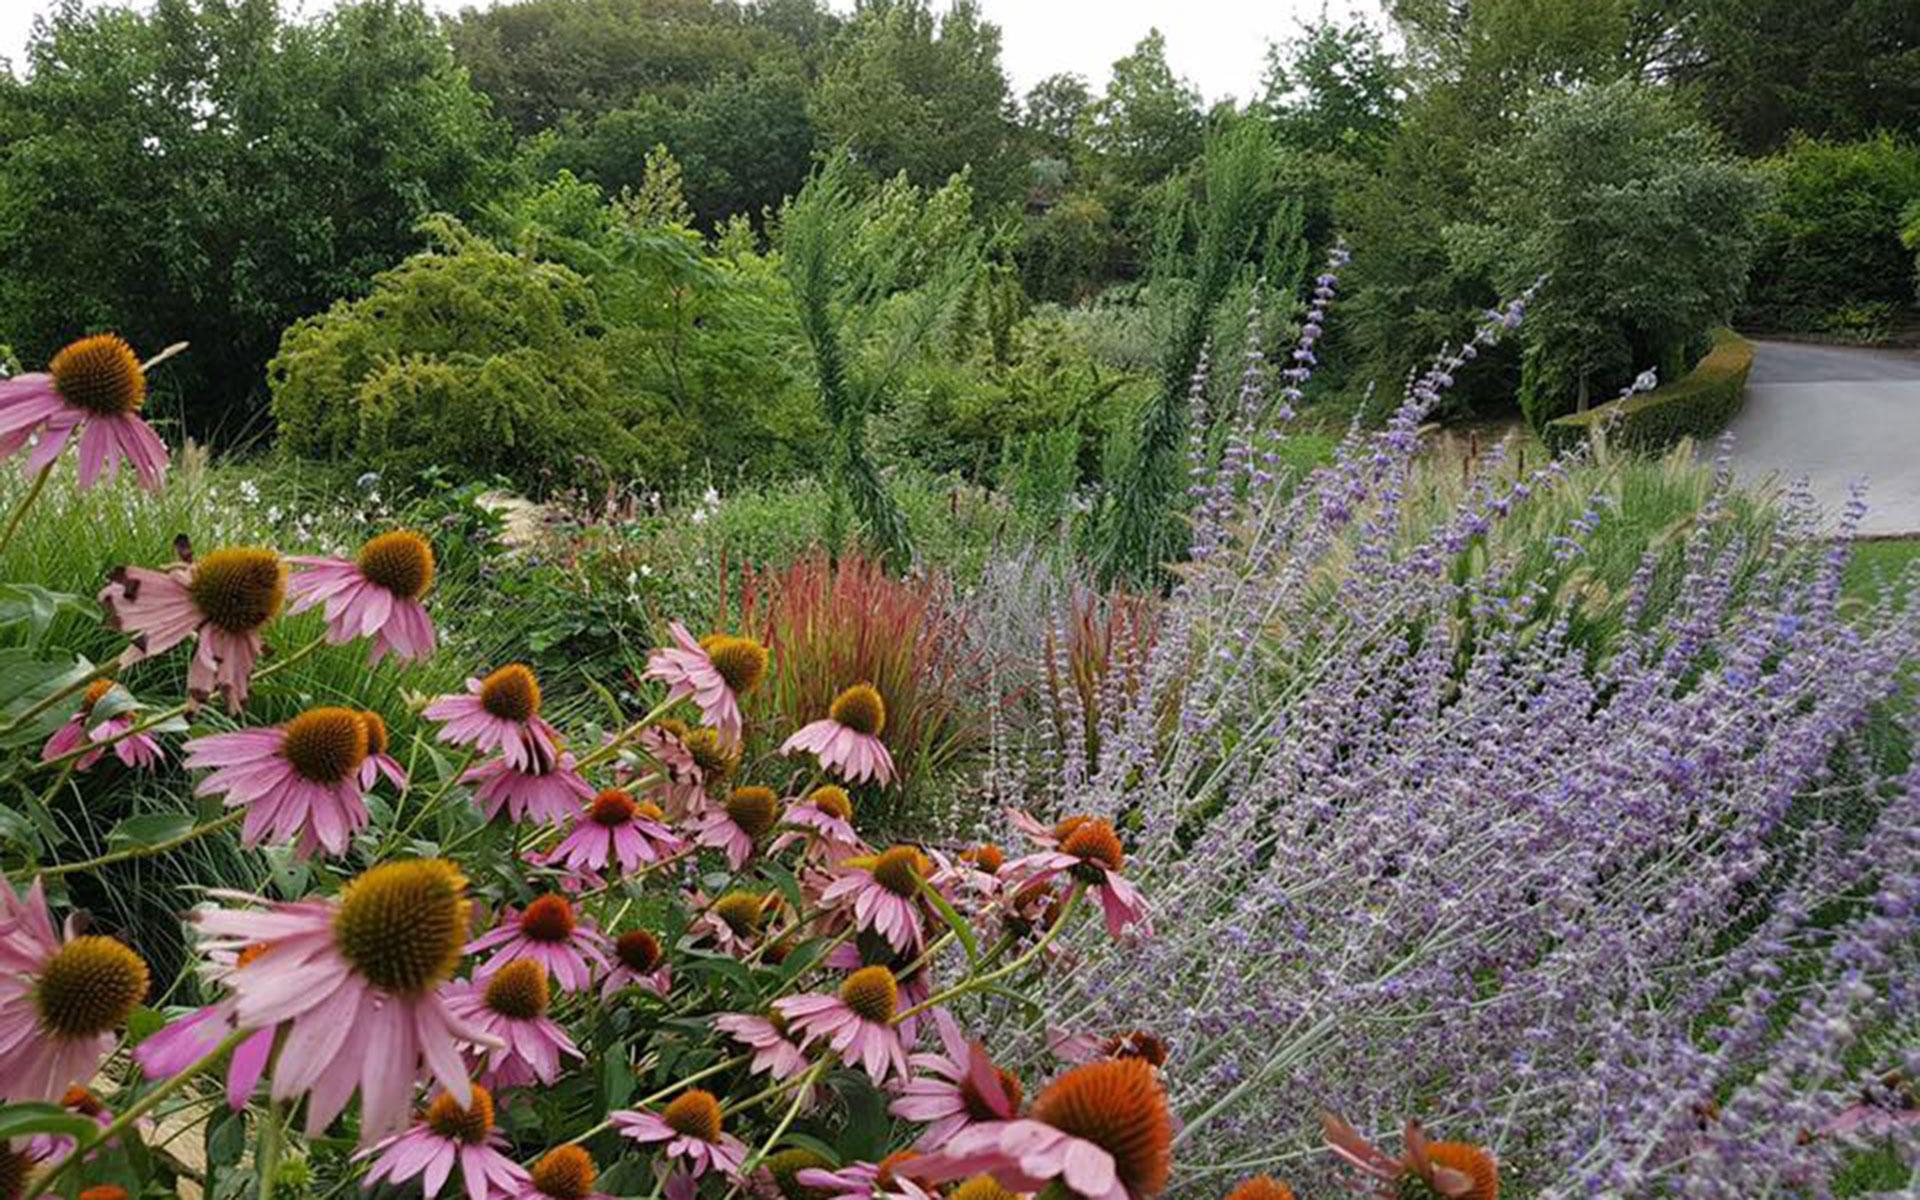 https://www.leforbici.eu/wp-content/uploads/2019/12/forbici-verde-giardino-naturale-lago-garda.jpg